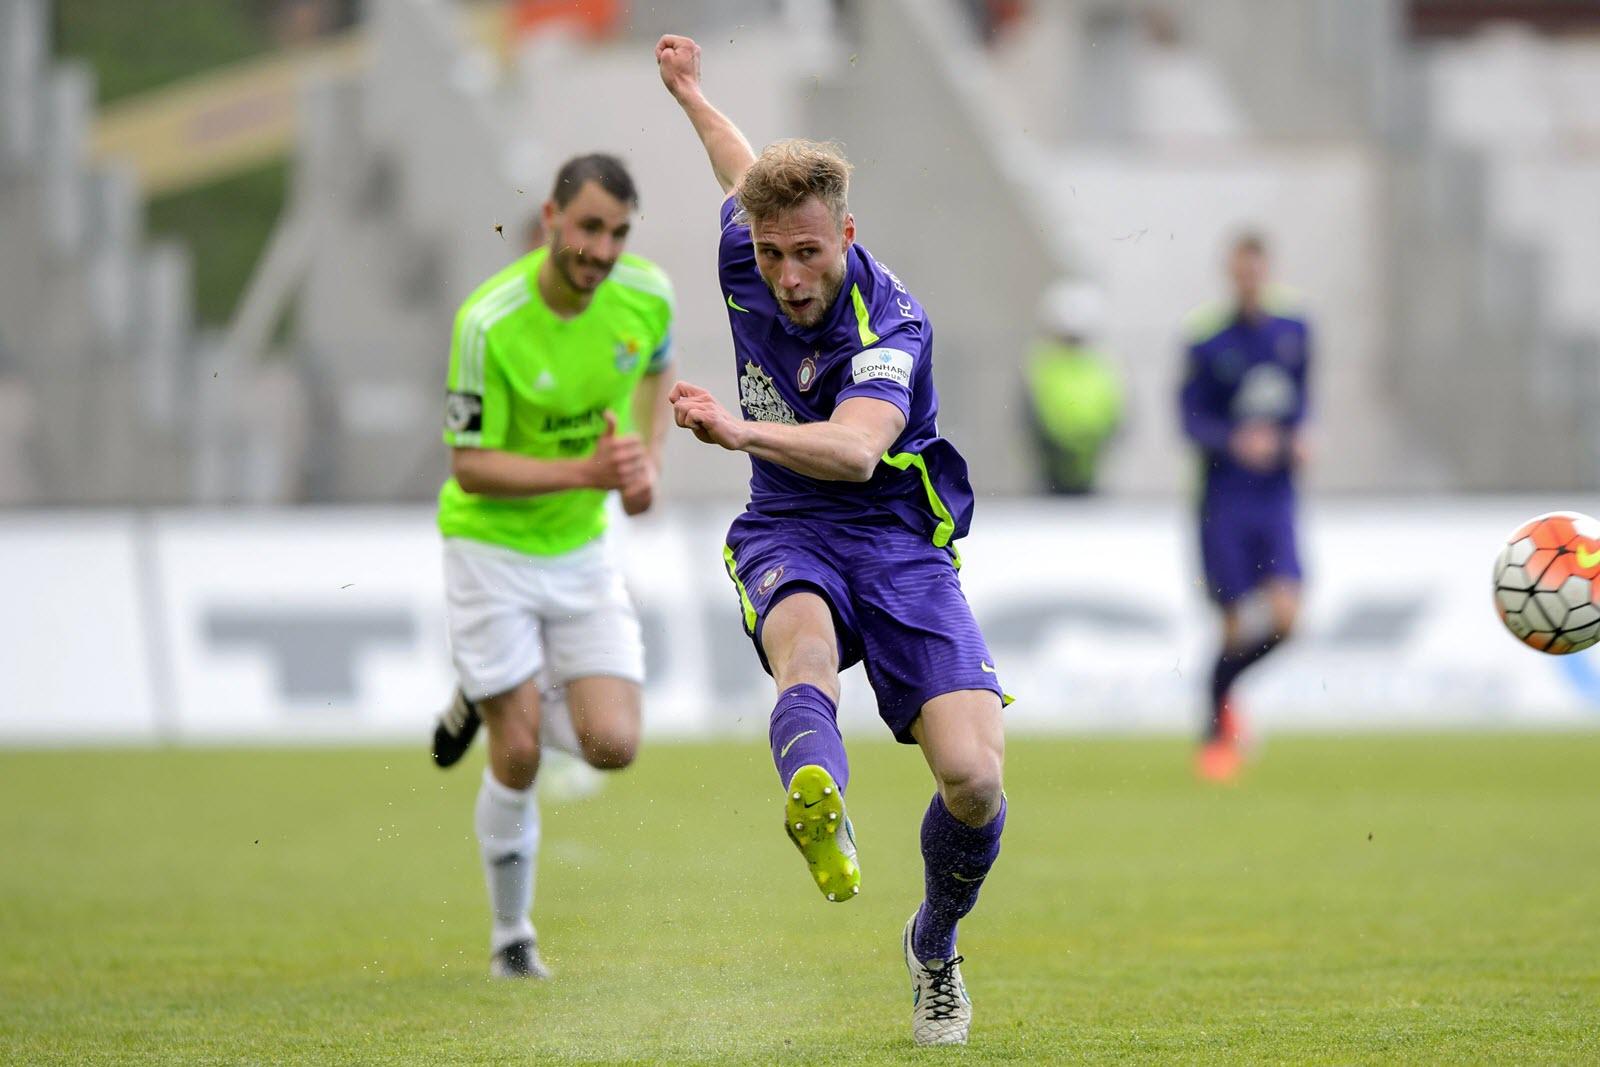 Max Wegner, Neuer Spieler in Lotte